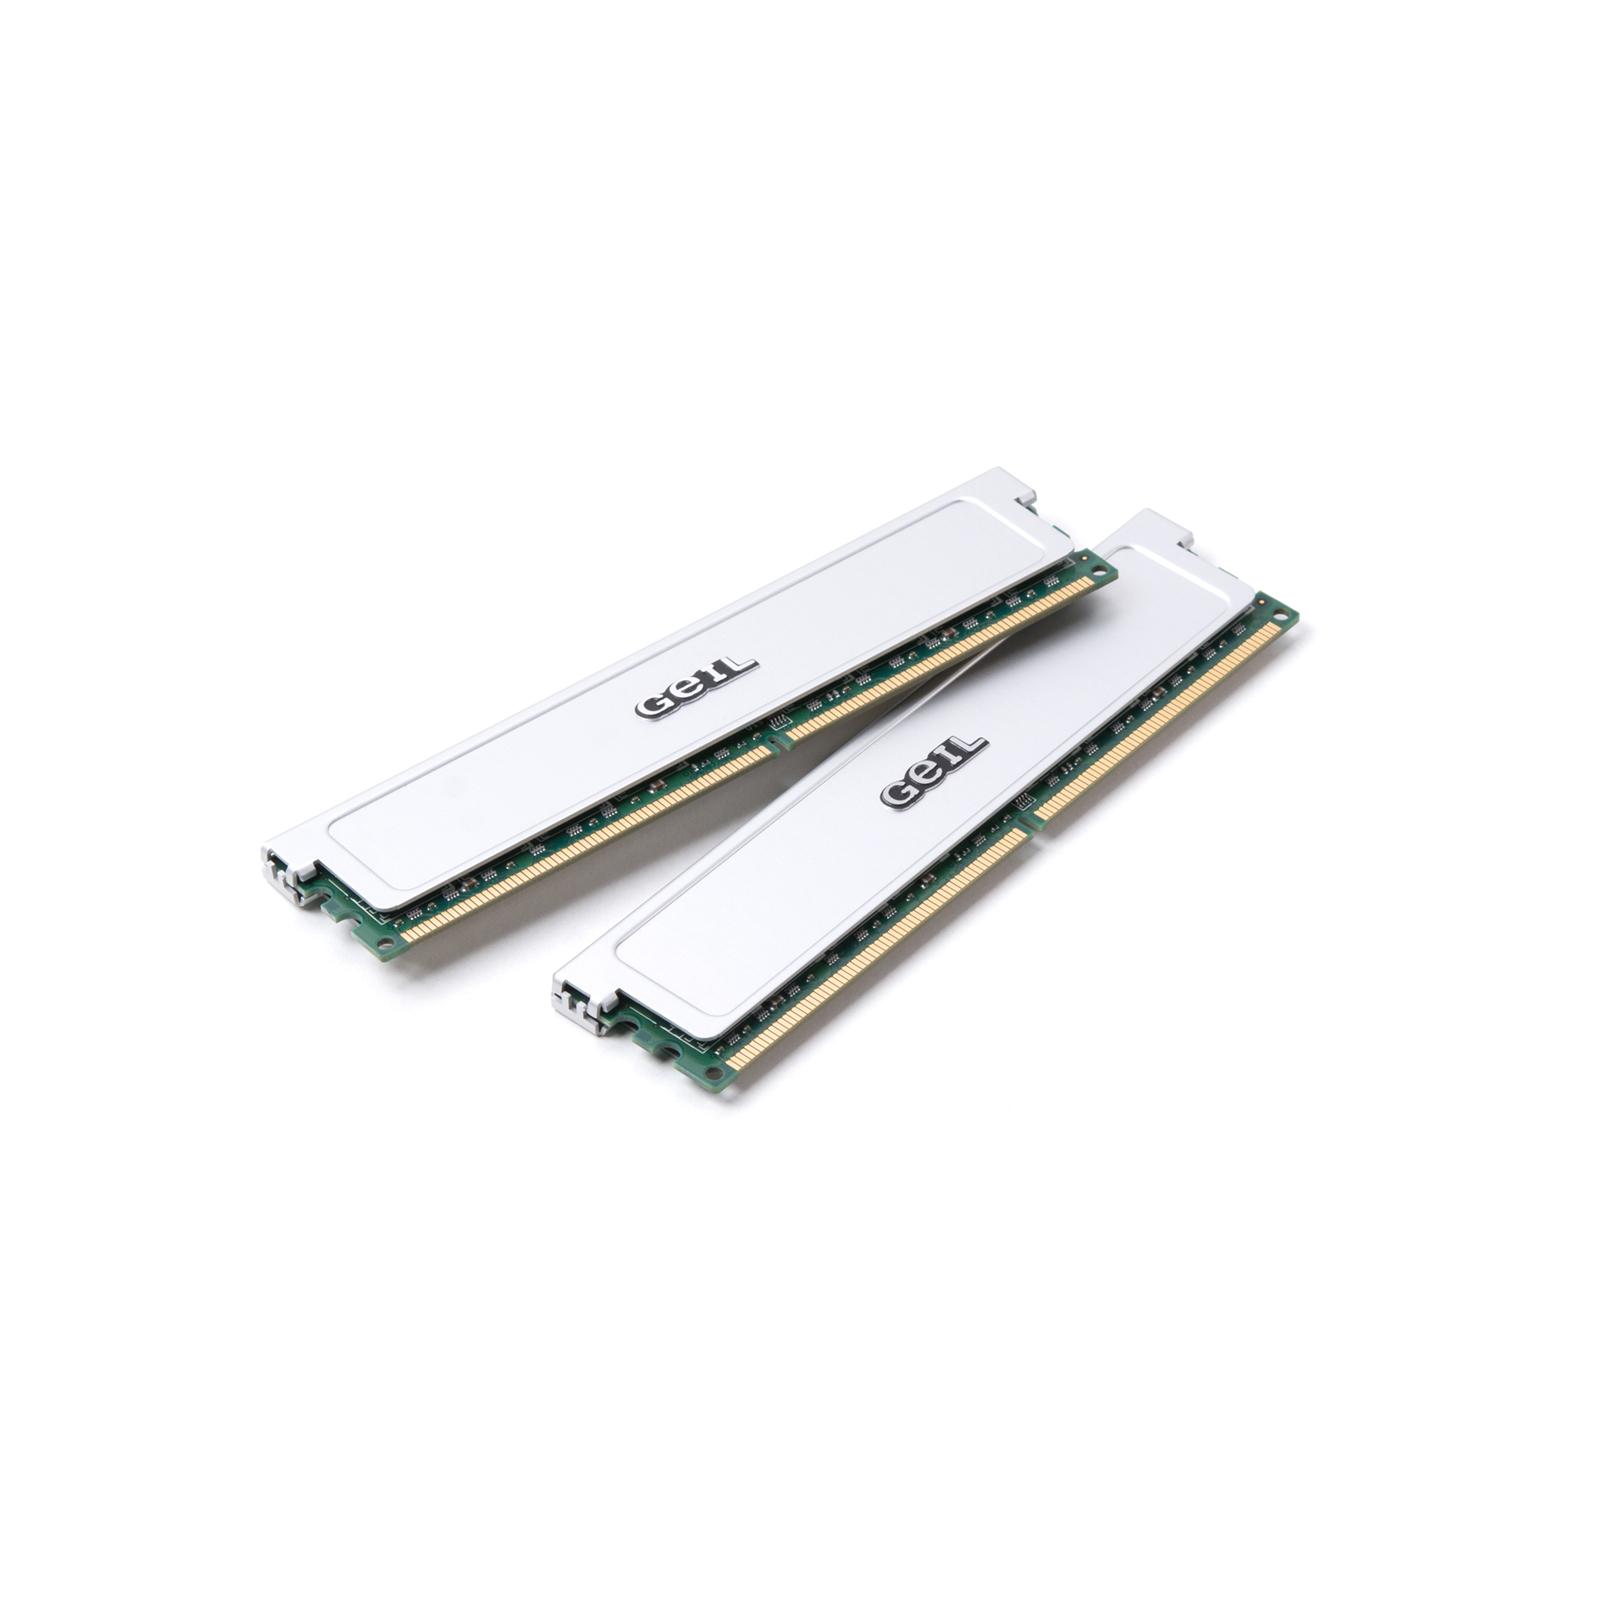 Модуль памяти для компьютера DDR2 4GB (2х2GB) 800 MHz GEIL (GX24GB6400DC)